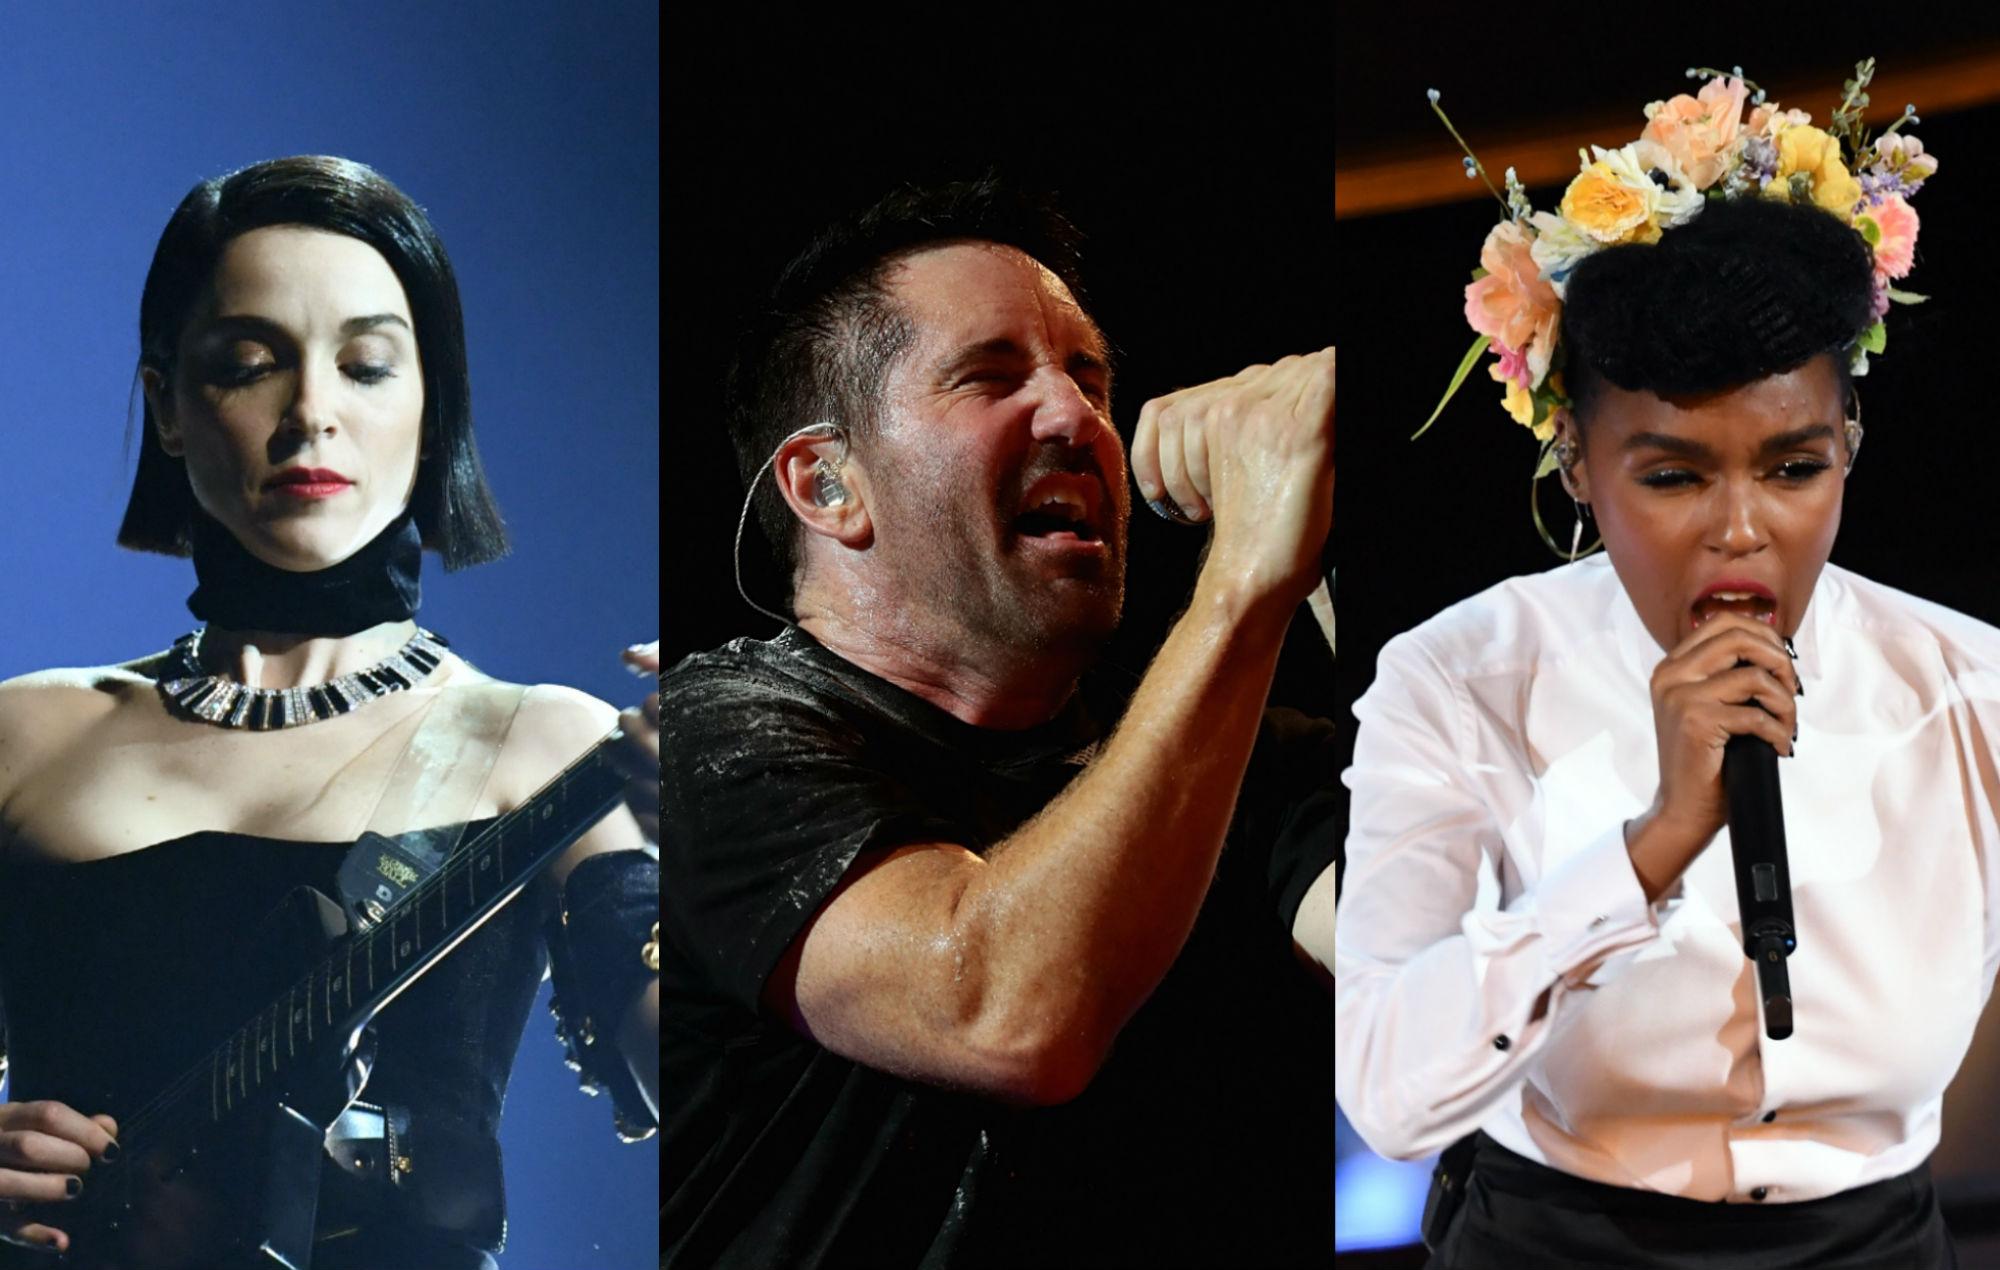 St Vincent, Trent Reznor, Janelle Monáe added to SXSW 2020 speakers line-up